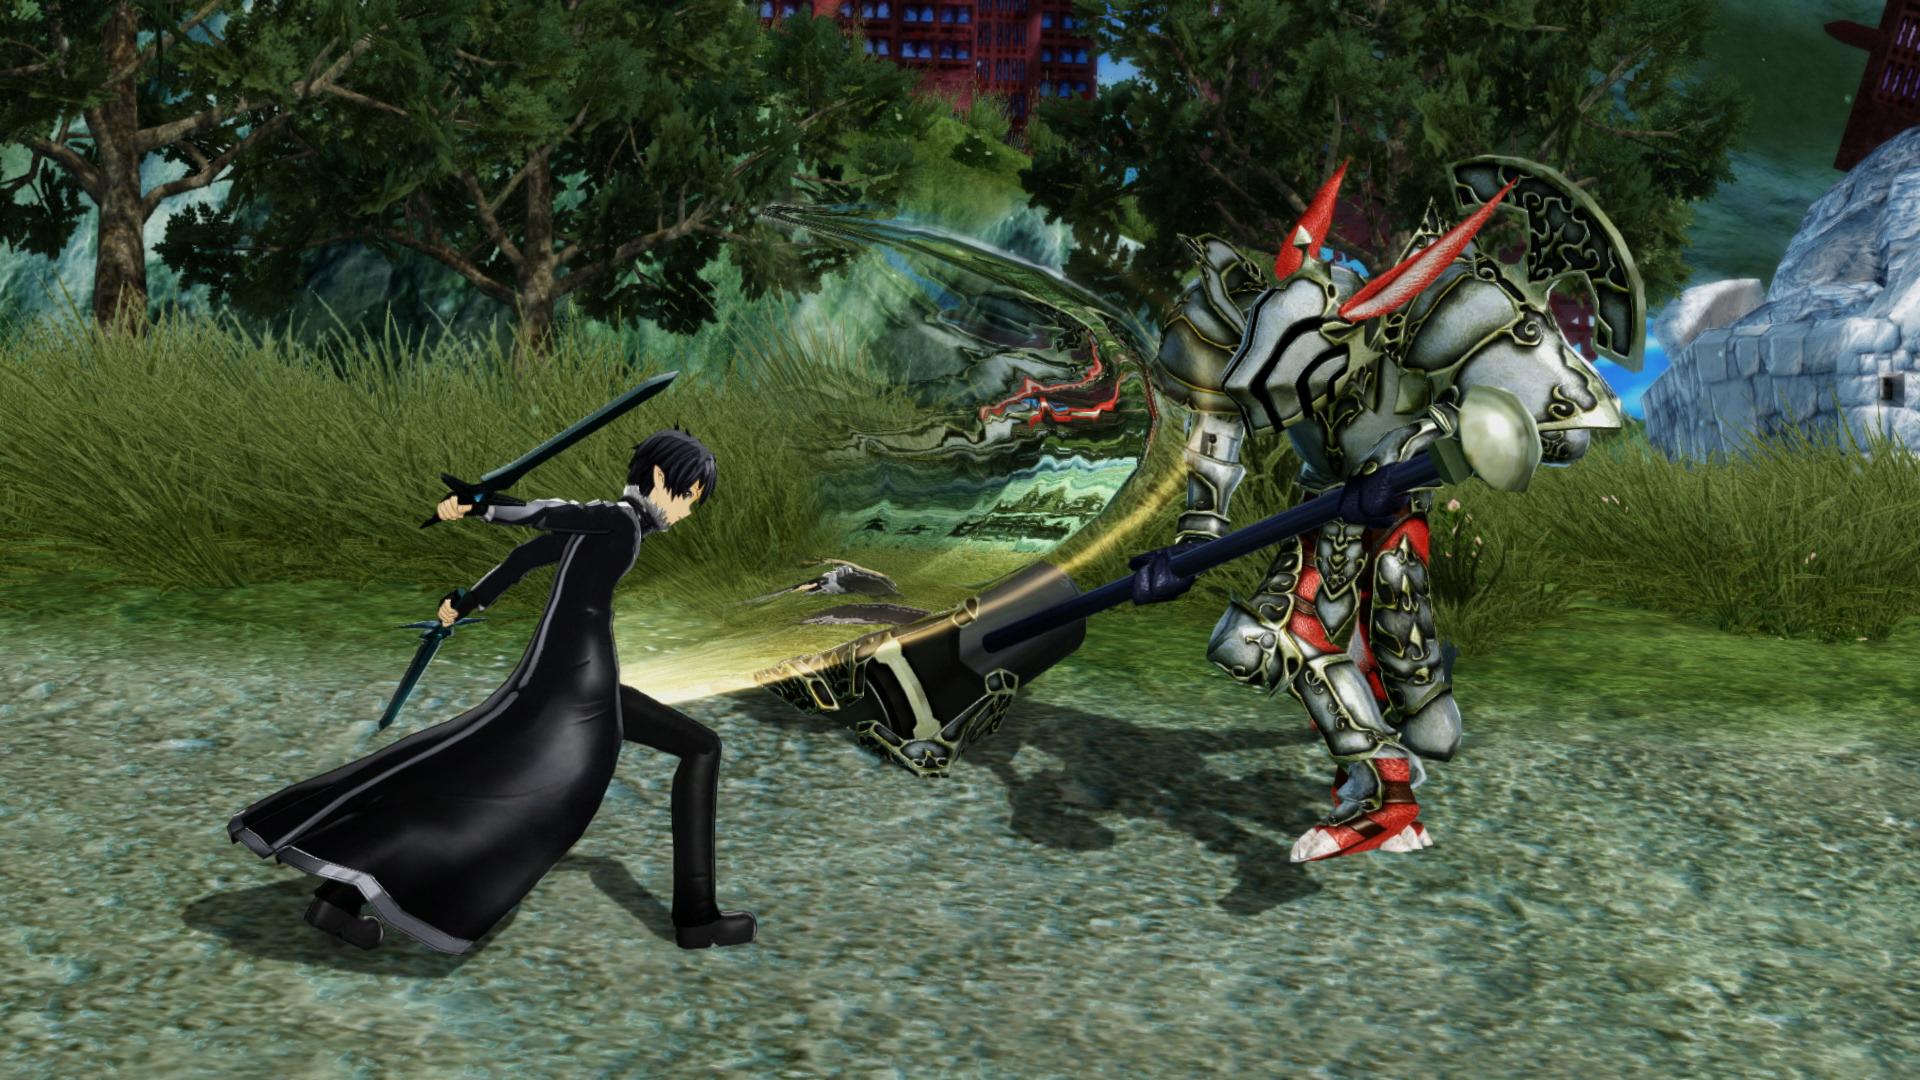 Download Accel World Vs Sword Art Online Deluxe Edition Cracked Repack [PC]